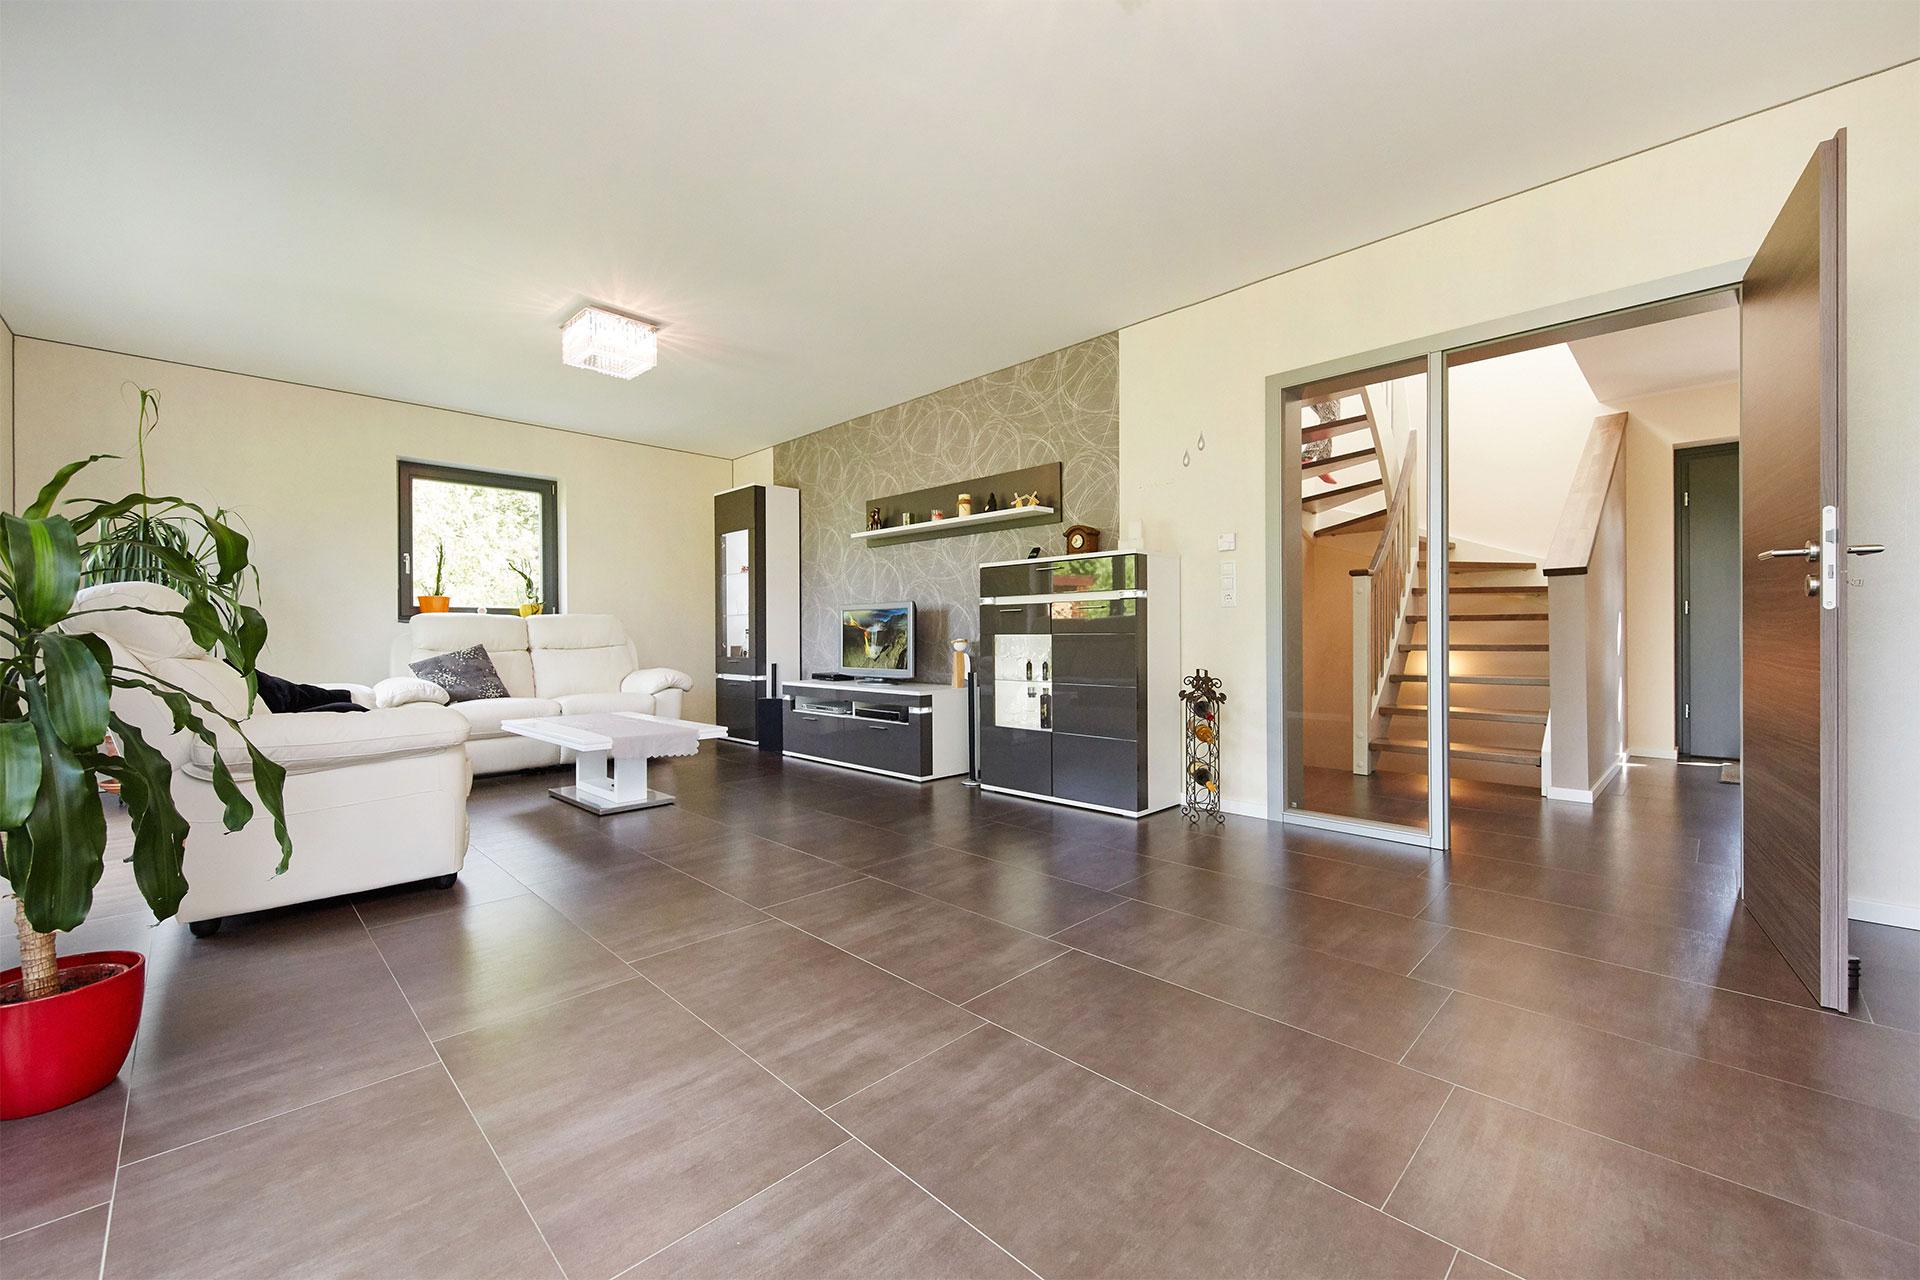 gussek haus gussek haus gussek haus isabella wuppertal gussek haus gussek haus h user. Black Bedroom Furniture Sets. Home Design Ideas